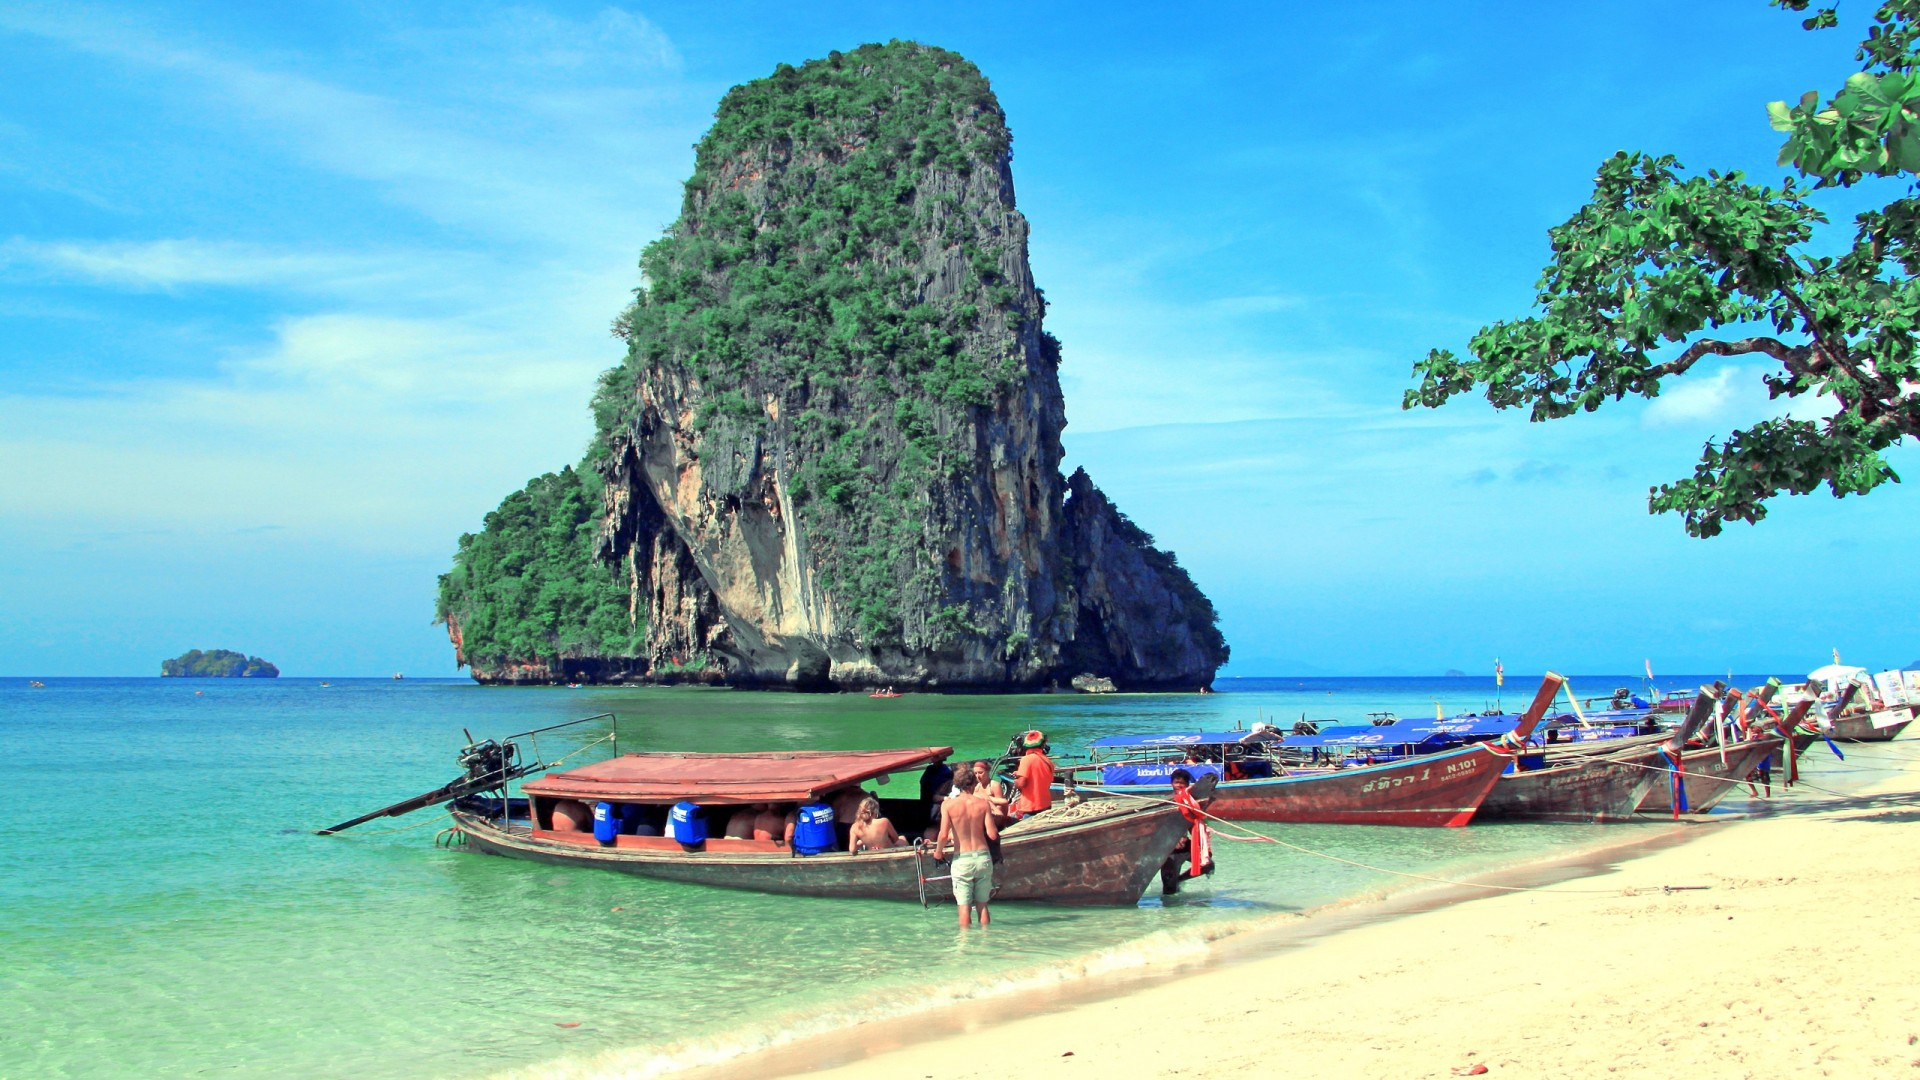 Thailand Island Beautiful Beach Fabulous Image Hd 1920x1080